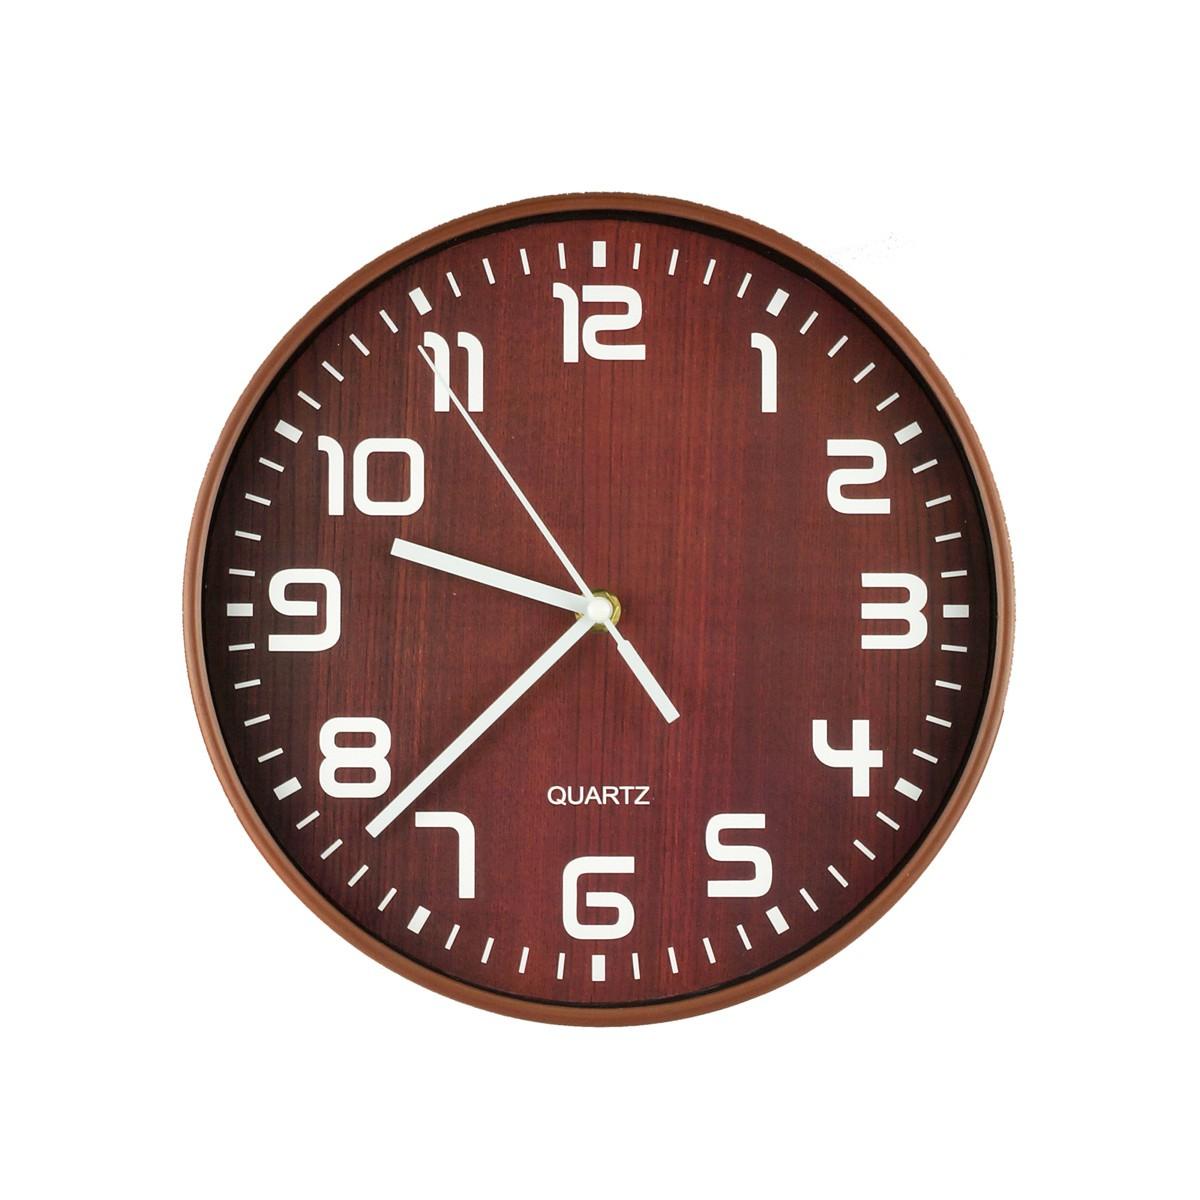 Relógio De Parede Wooden Finish Marrom 25cm Urban